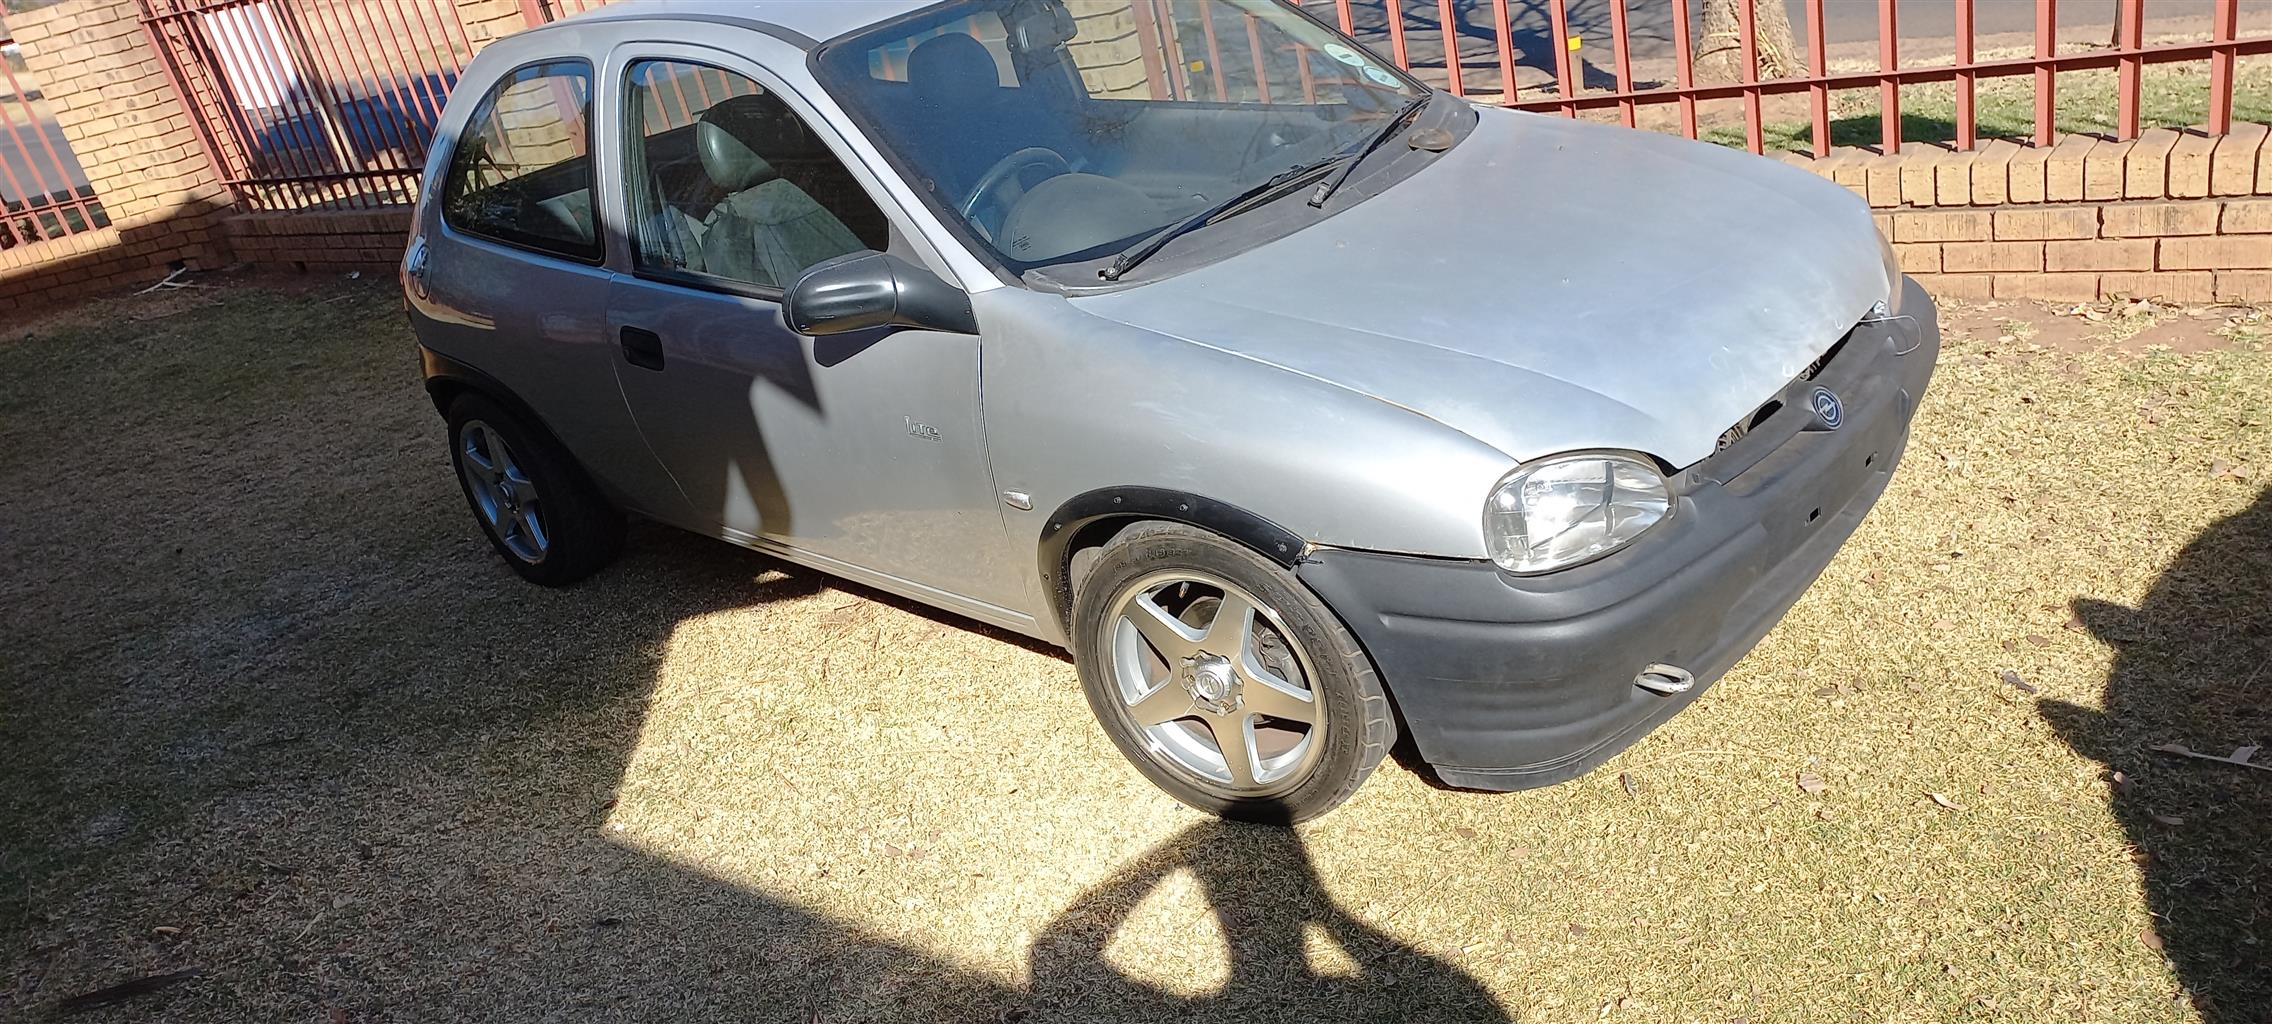 Opel corsa 1.4i 2007